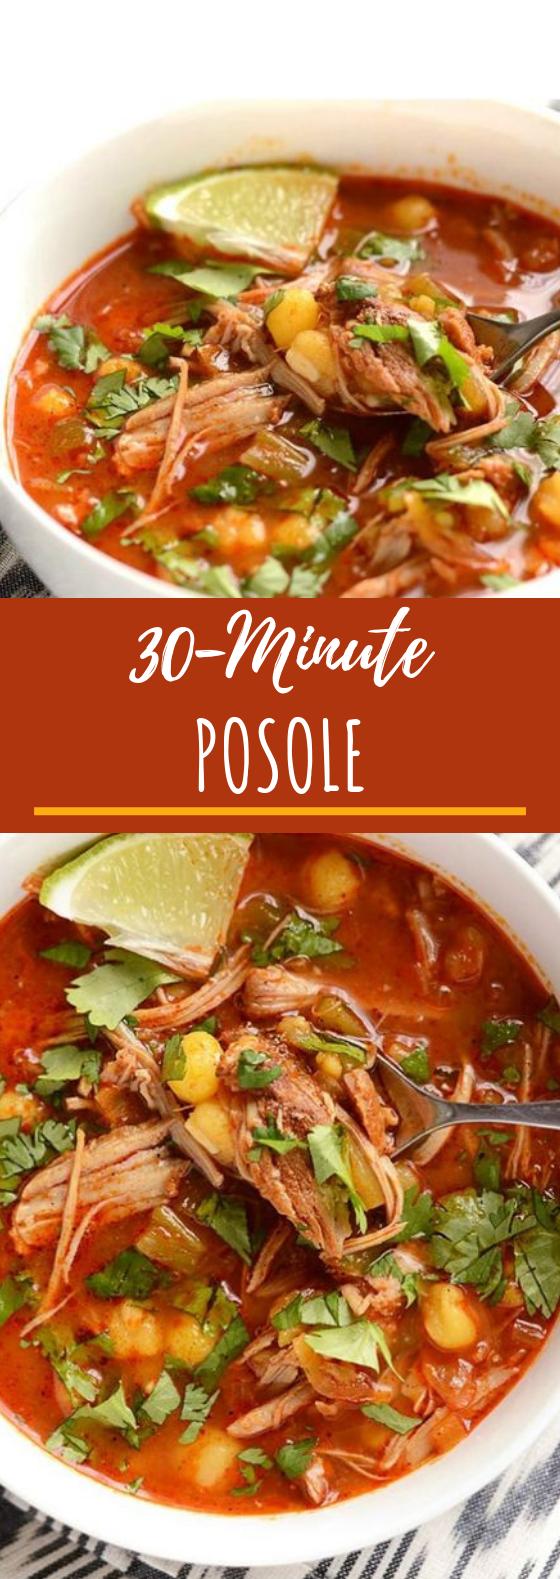 30 Minute Posole #dinner #recipe